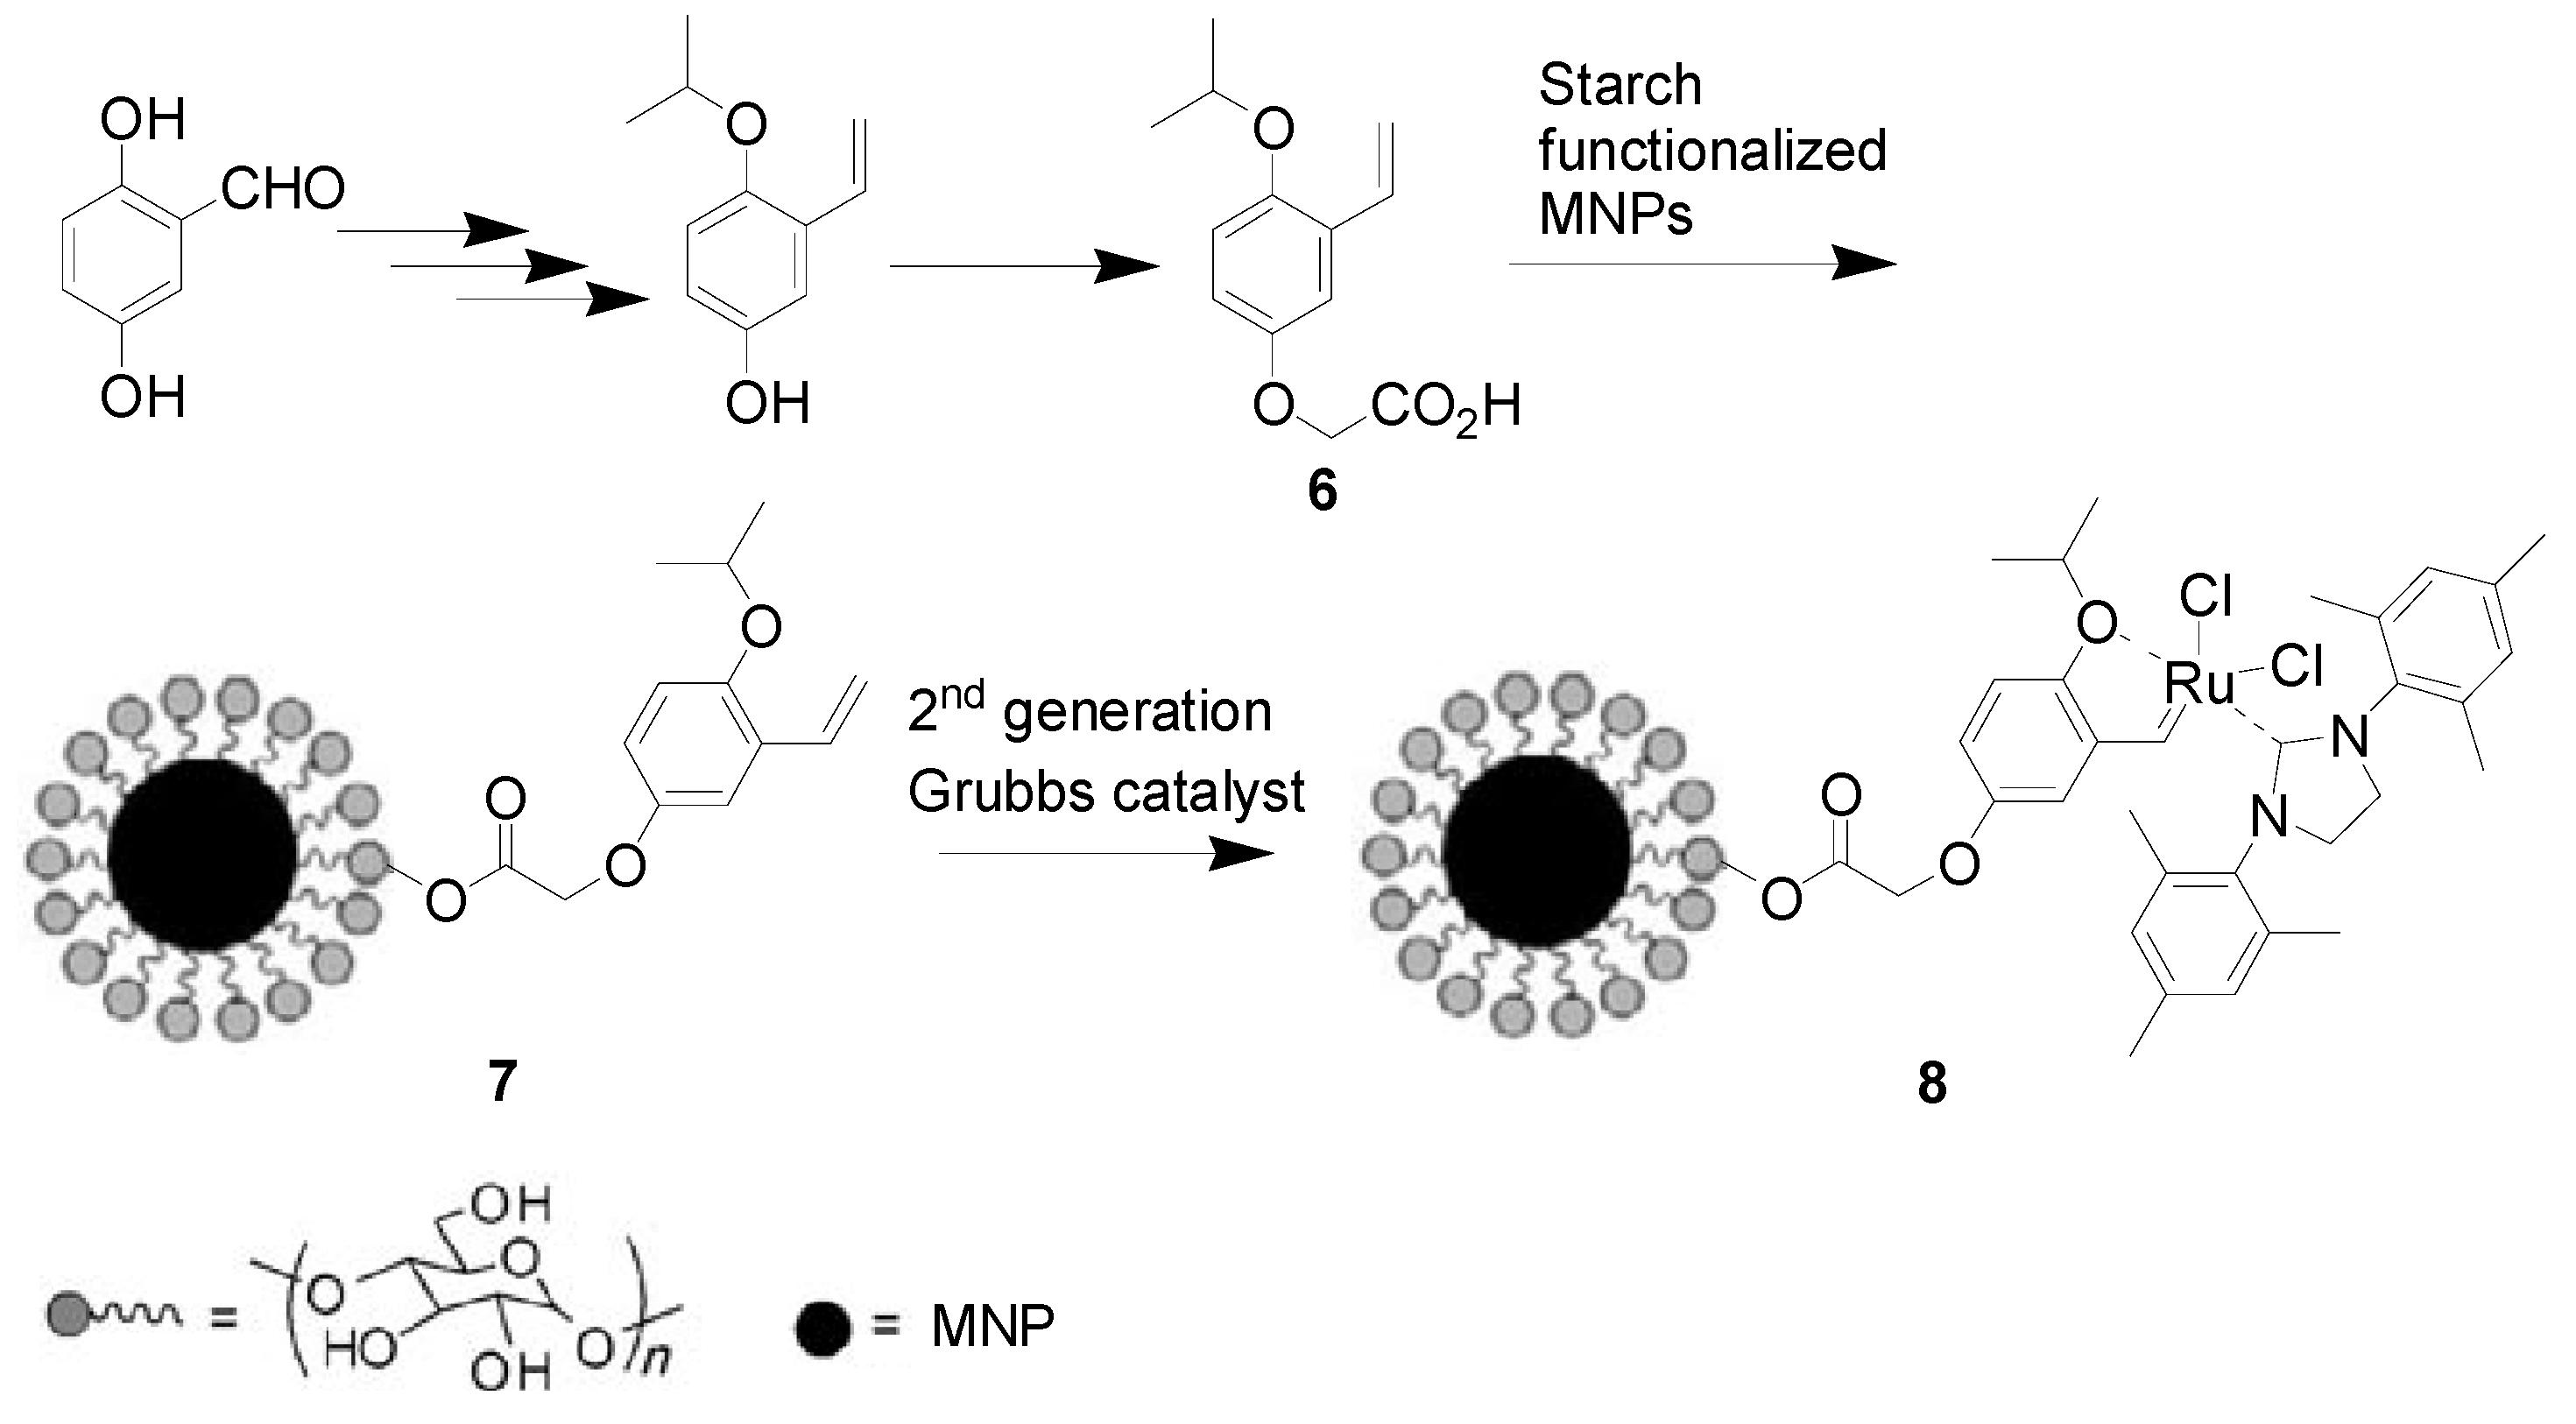 olefins metathesis 2038 olefin metathesis in air lorenzo€piola1, fady€nahra1 and€steven€p€nolan2 review open access address: 1eastchem, school of chemistry, university of st andrews, st.